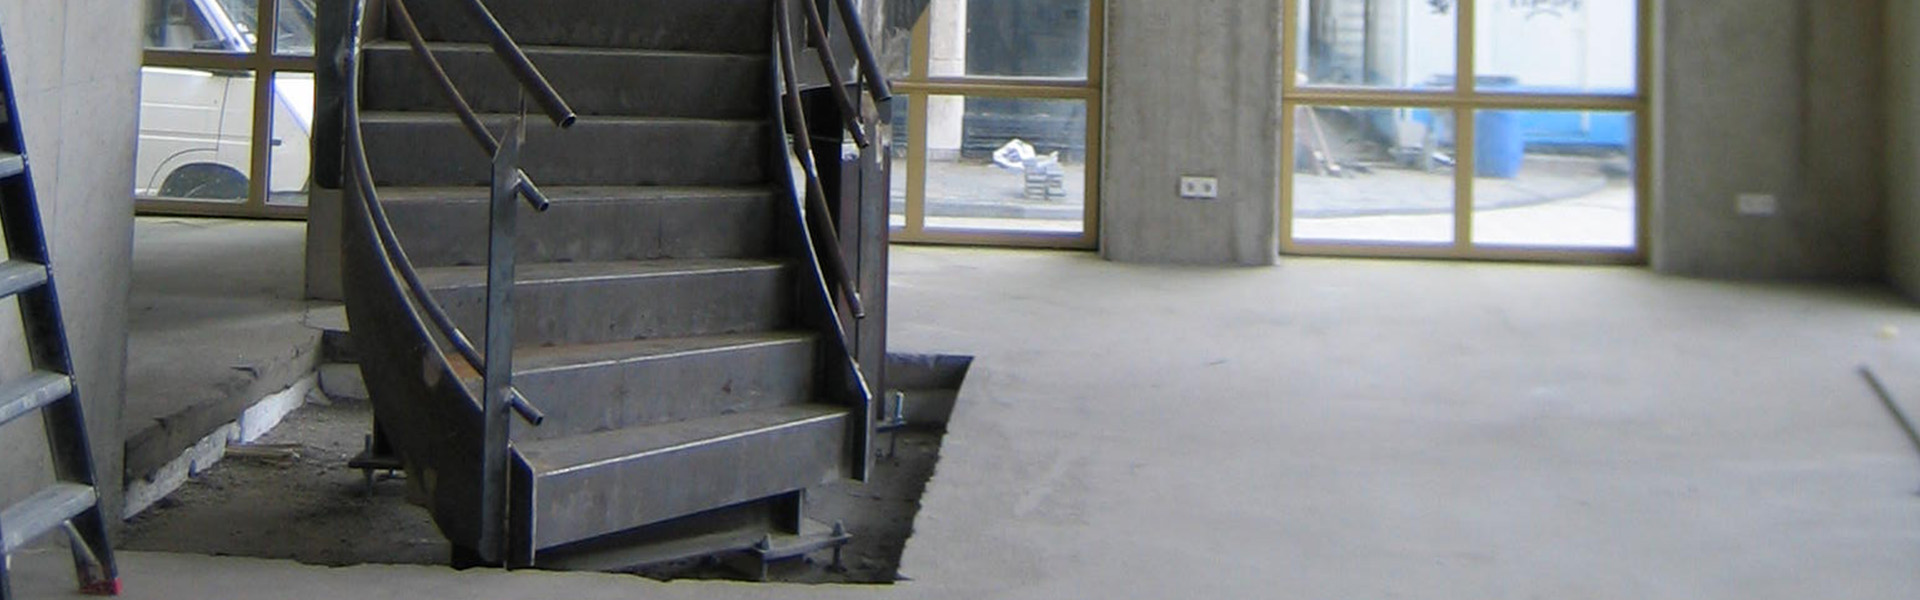 Restaurant De Coopvaert Rotterdam - levering trap